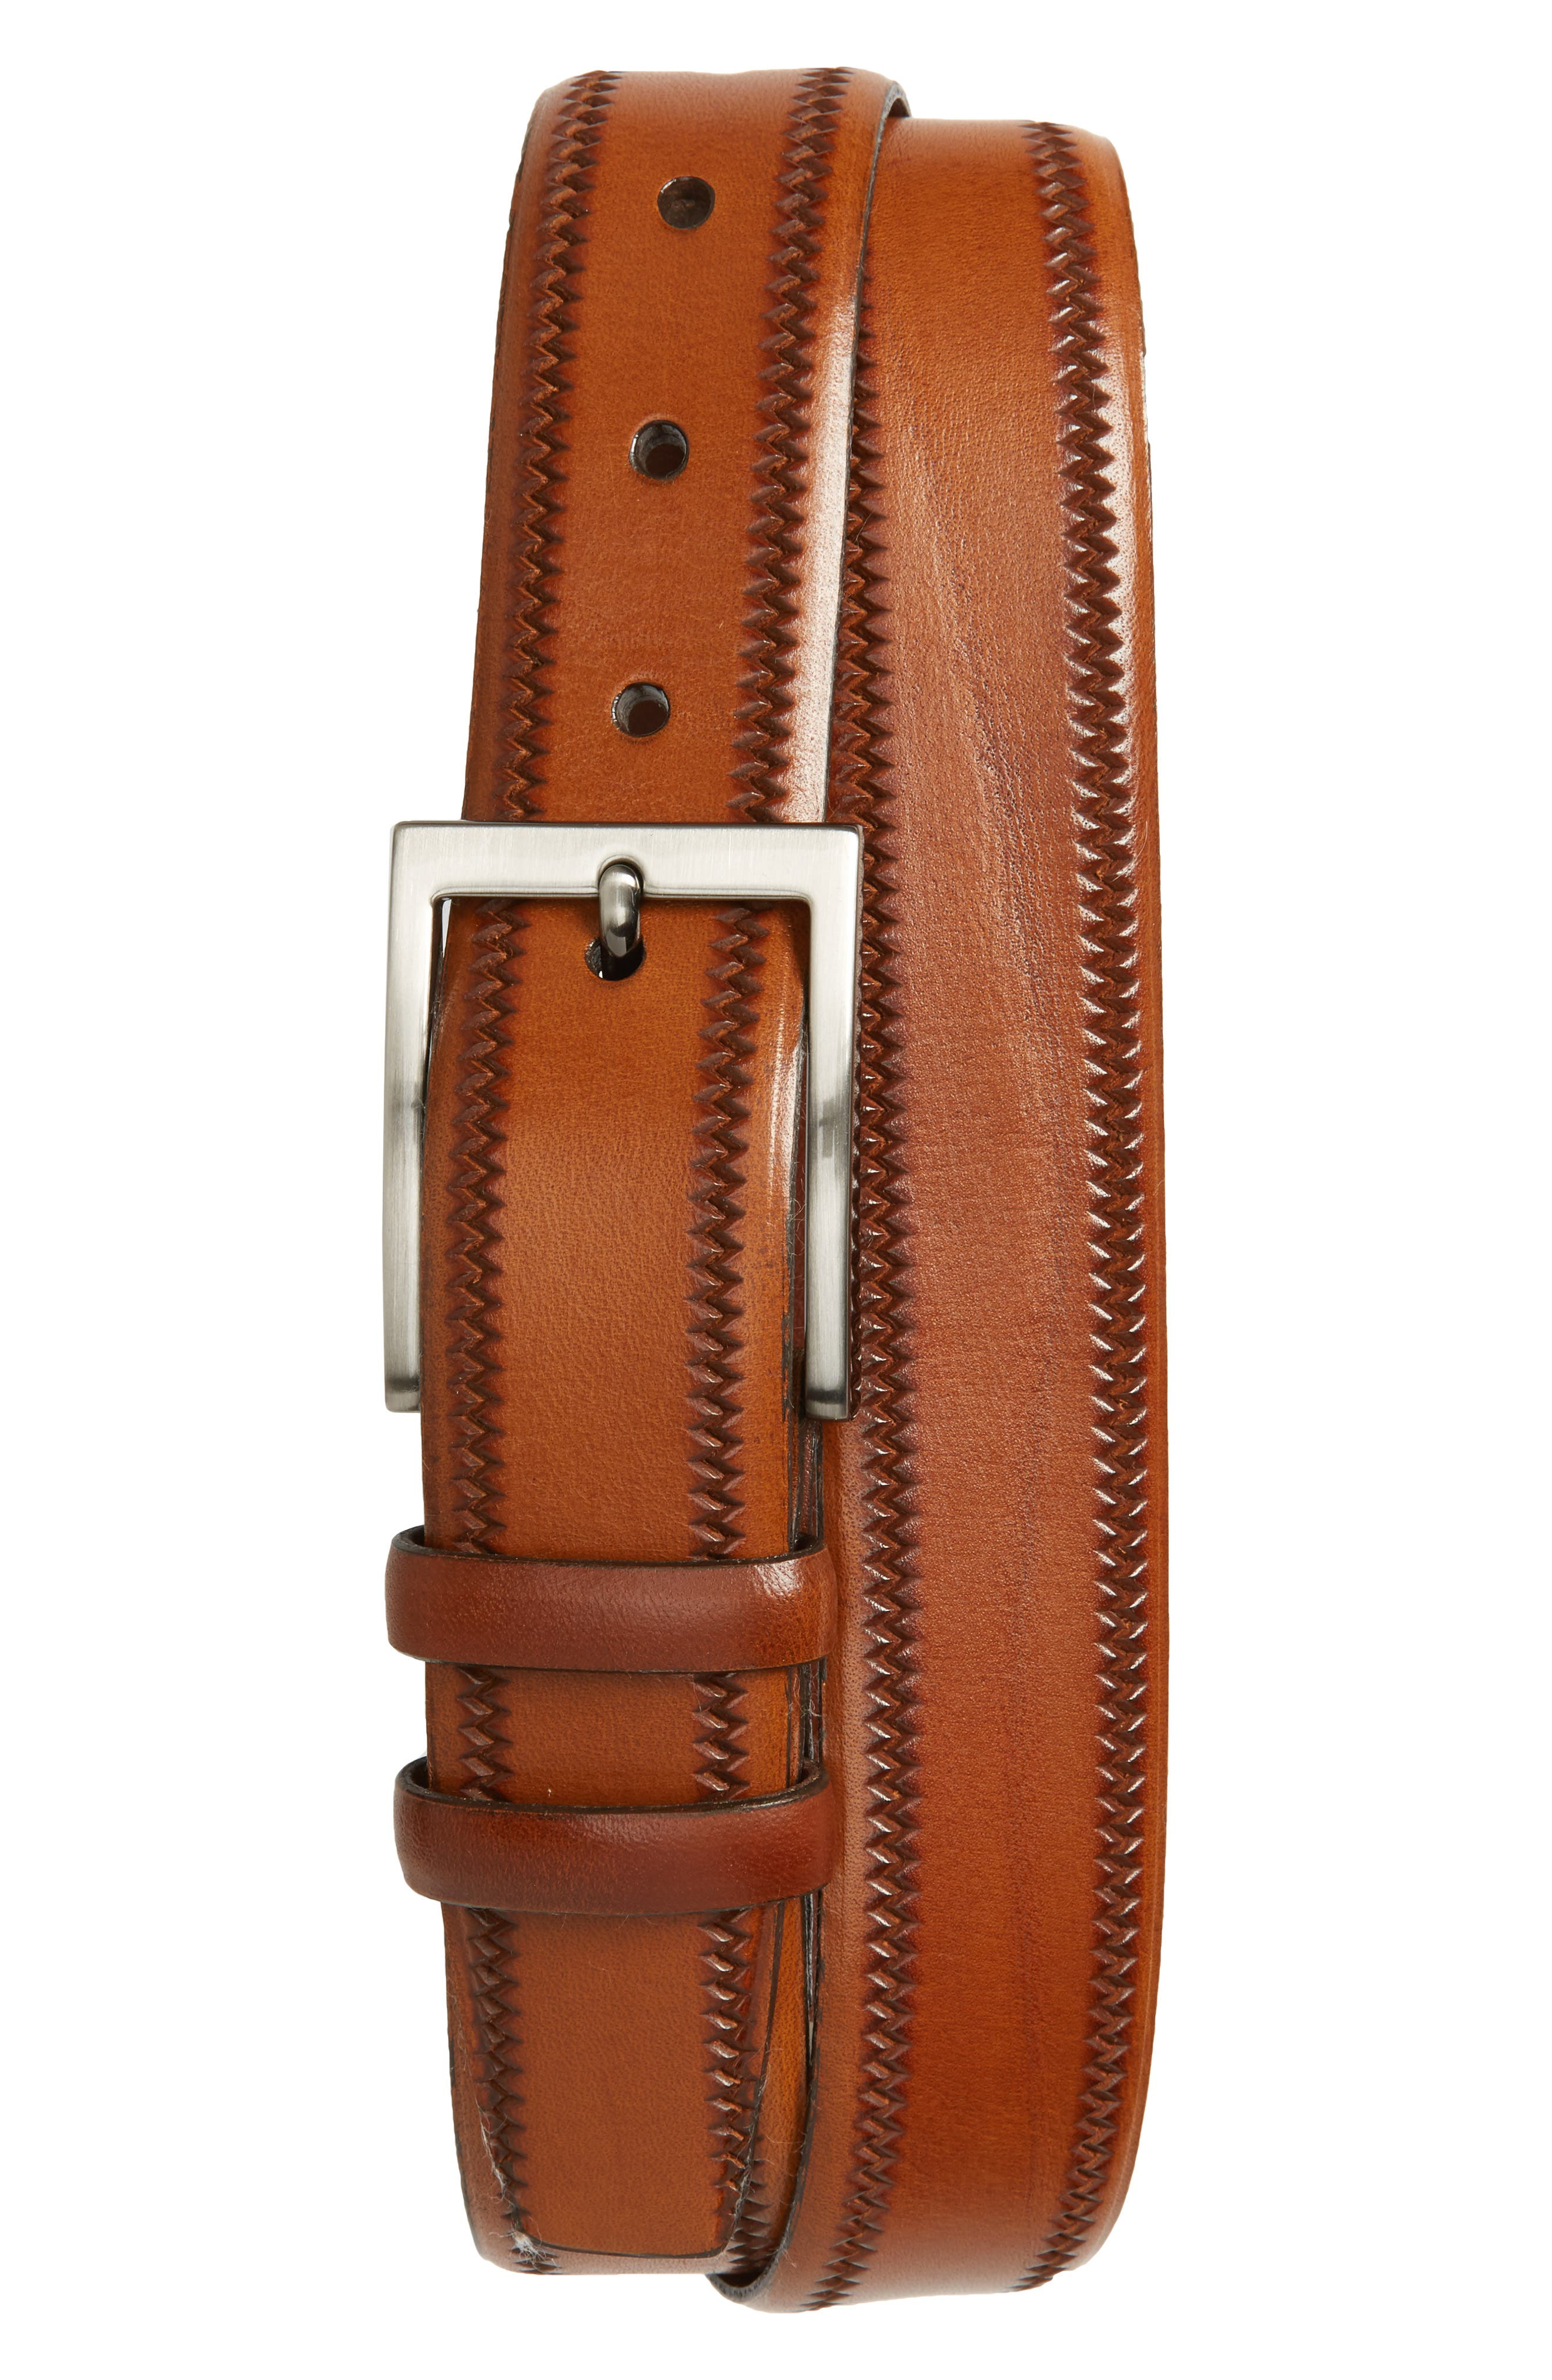 Alternate Image 1 Selected - Torino Belts Embossed Leather Belt